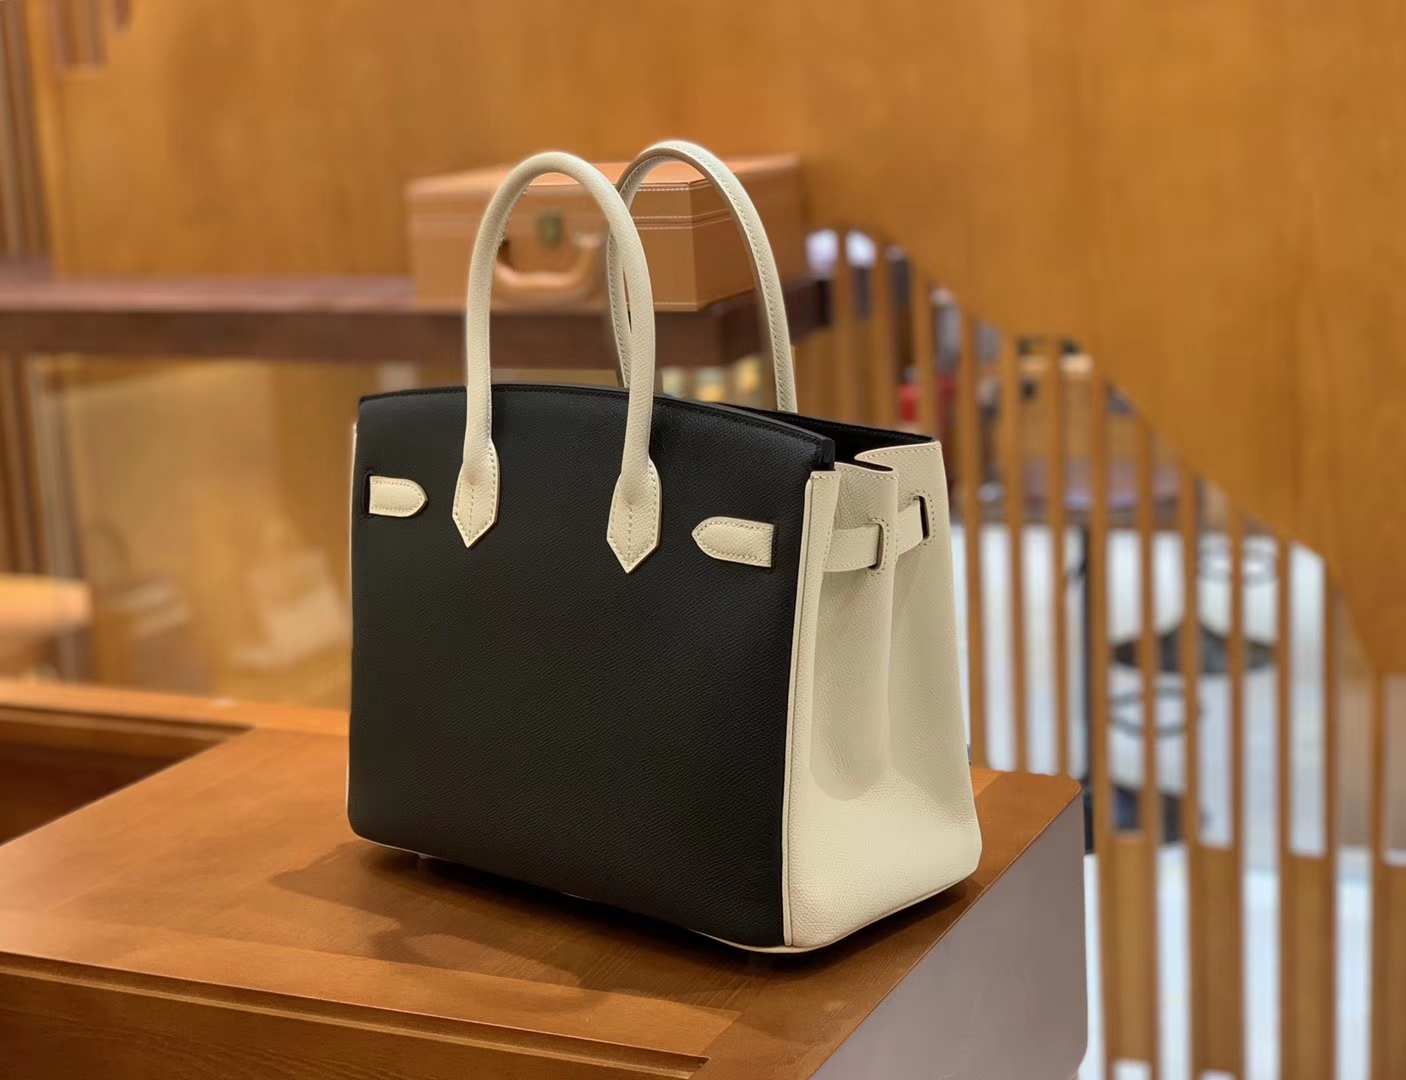 Hermès(爱马仕)Birkin 奶昔白拼经典黑 德国进口掌纹牛皮 全手工蜡线缝制 30cm